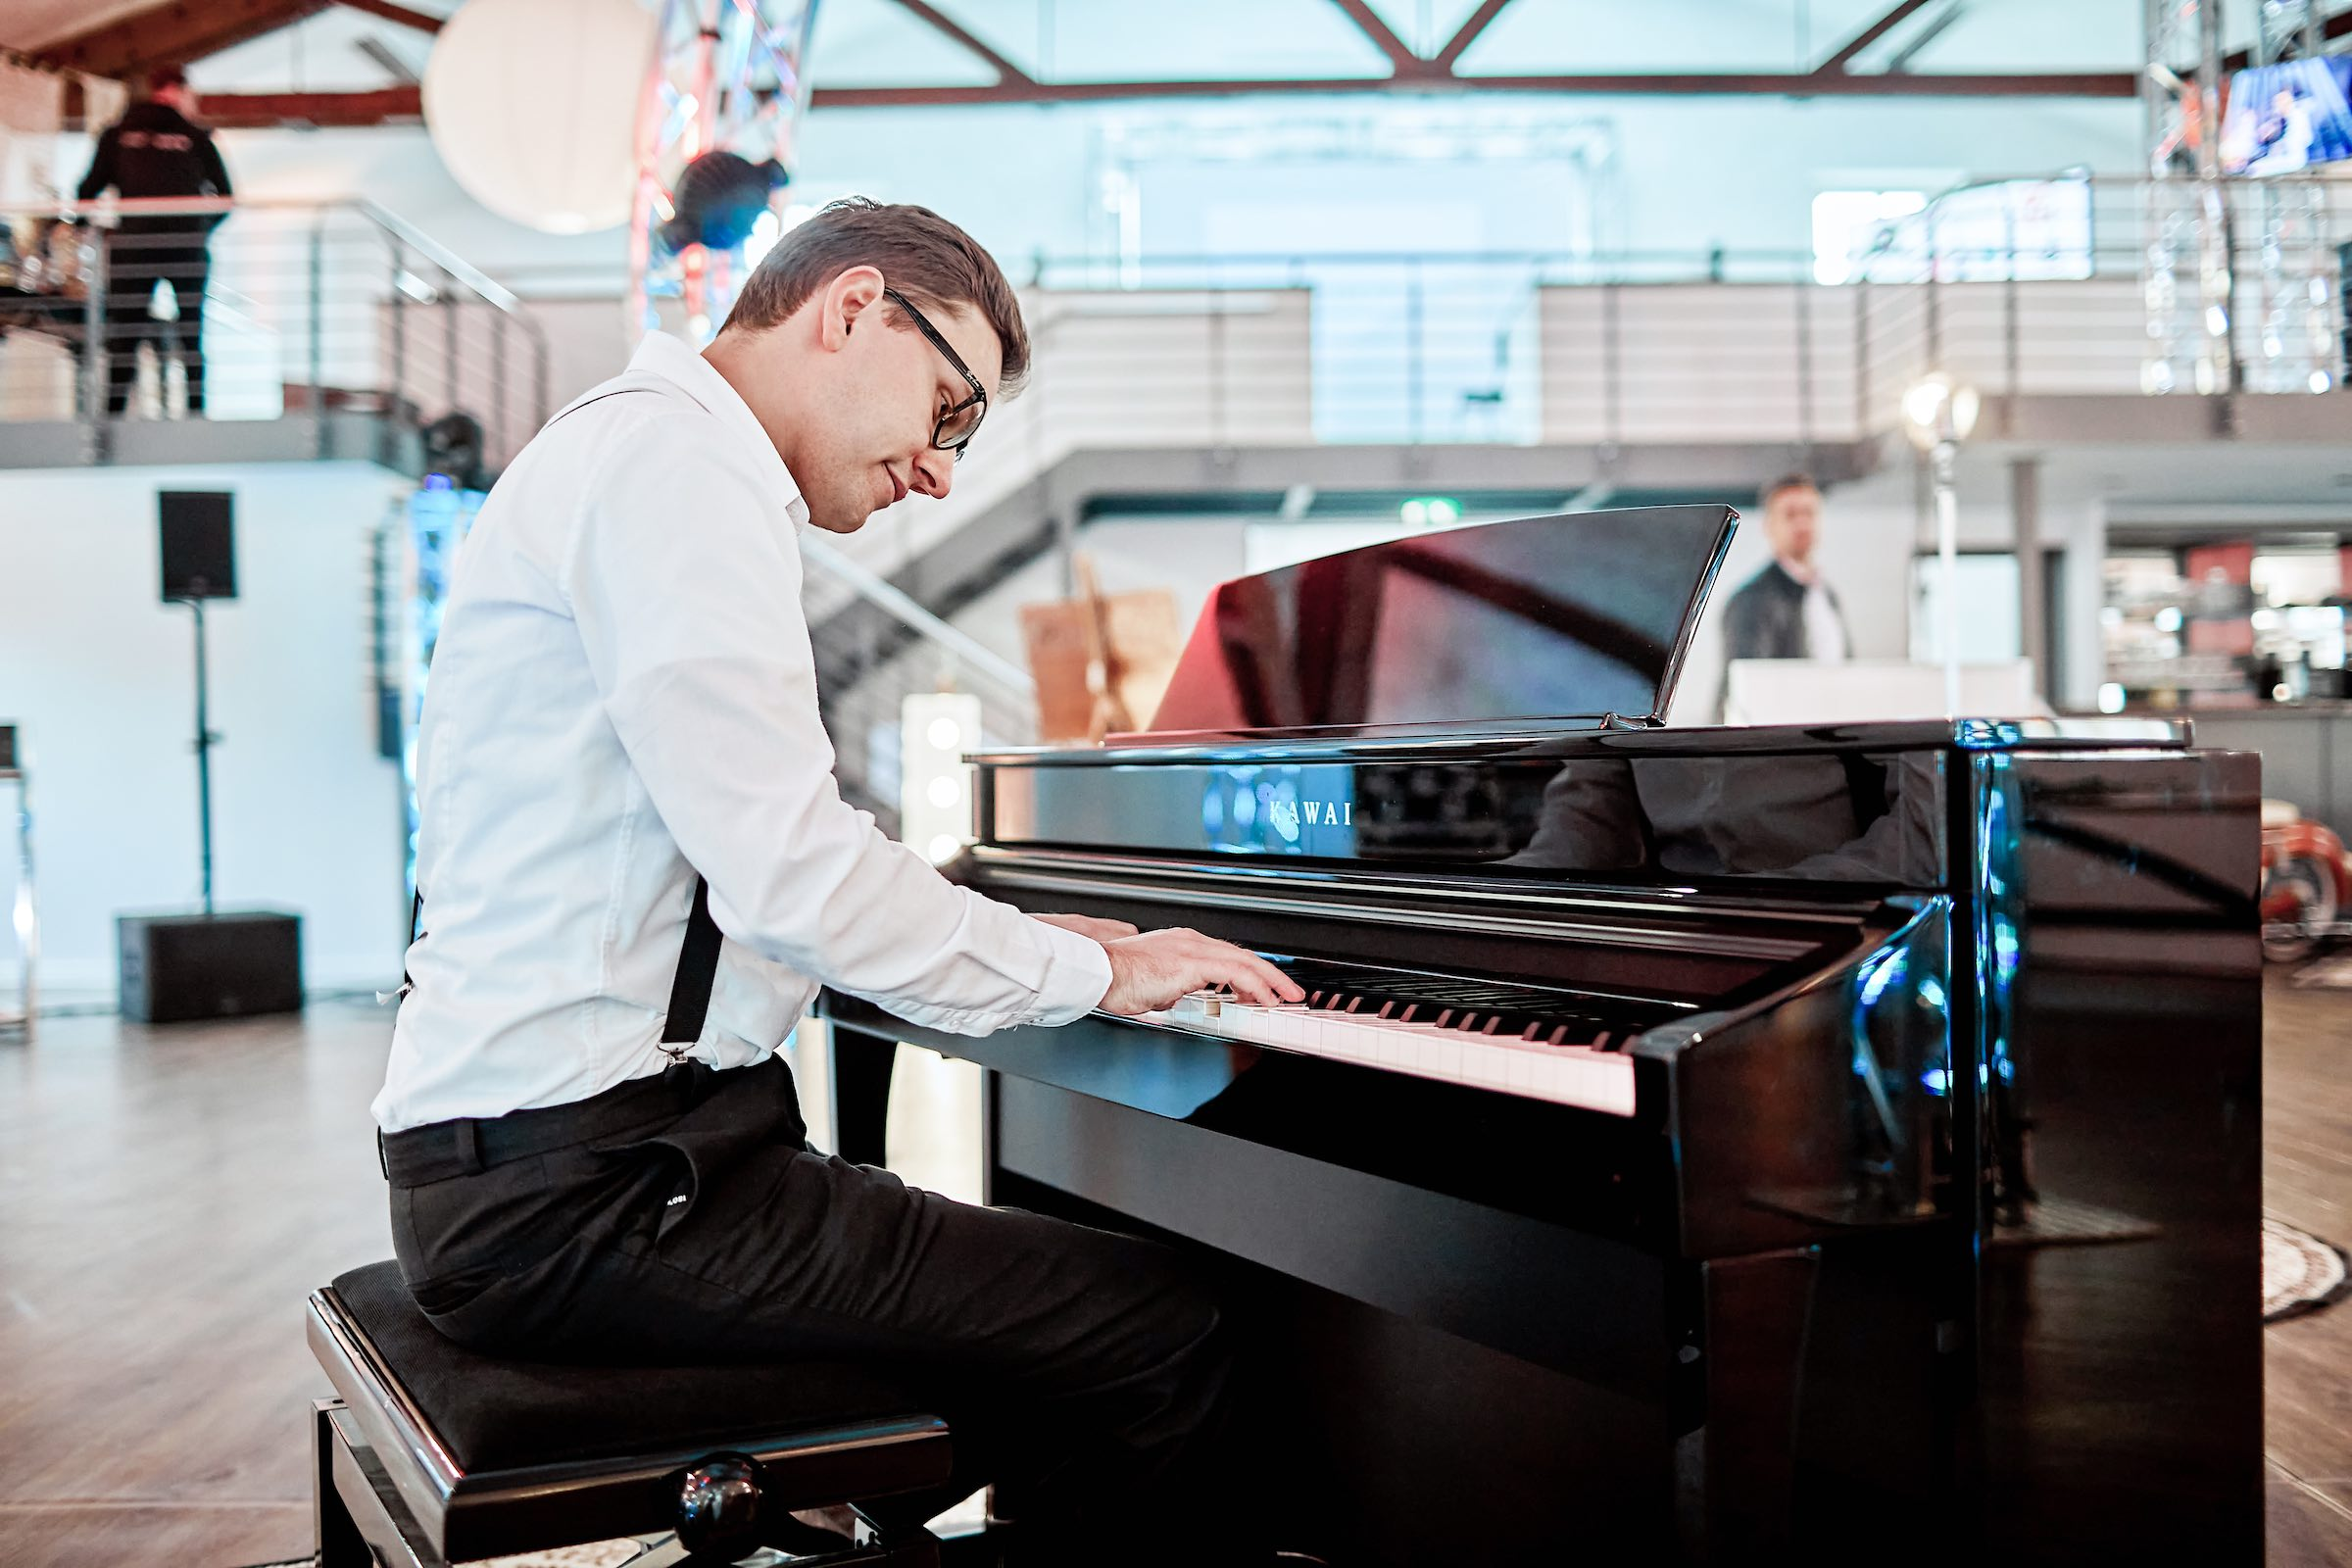 Pianist   Klavierspieler   Barpiano   Barpianist   Hannover   Alexander   Barsch   Hochzeit   Empfang   Trauung   Sektempfang   Dinner   Kirche   Buchen   Mieten   Anfragen   Lehmann   Eventservice